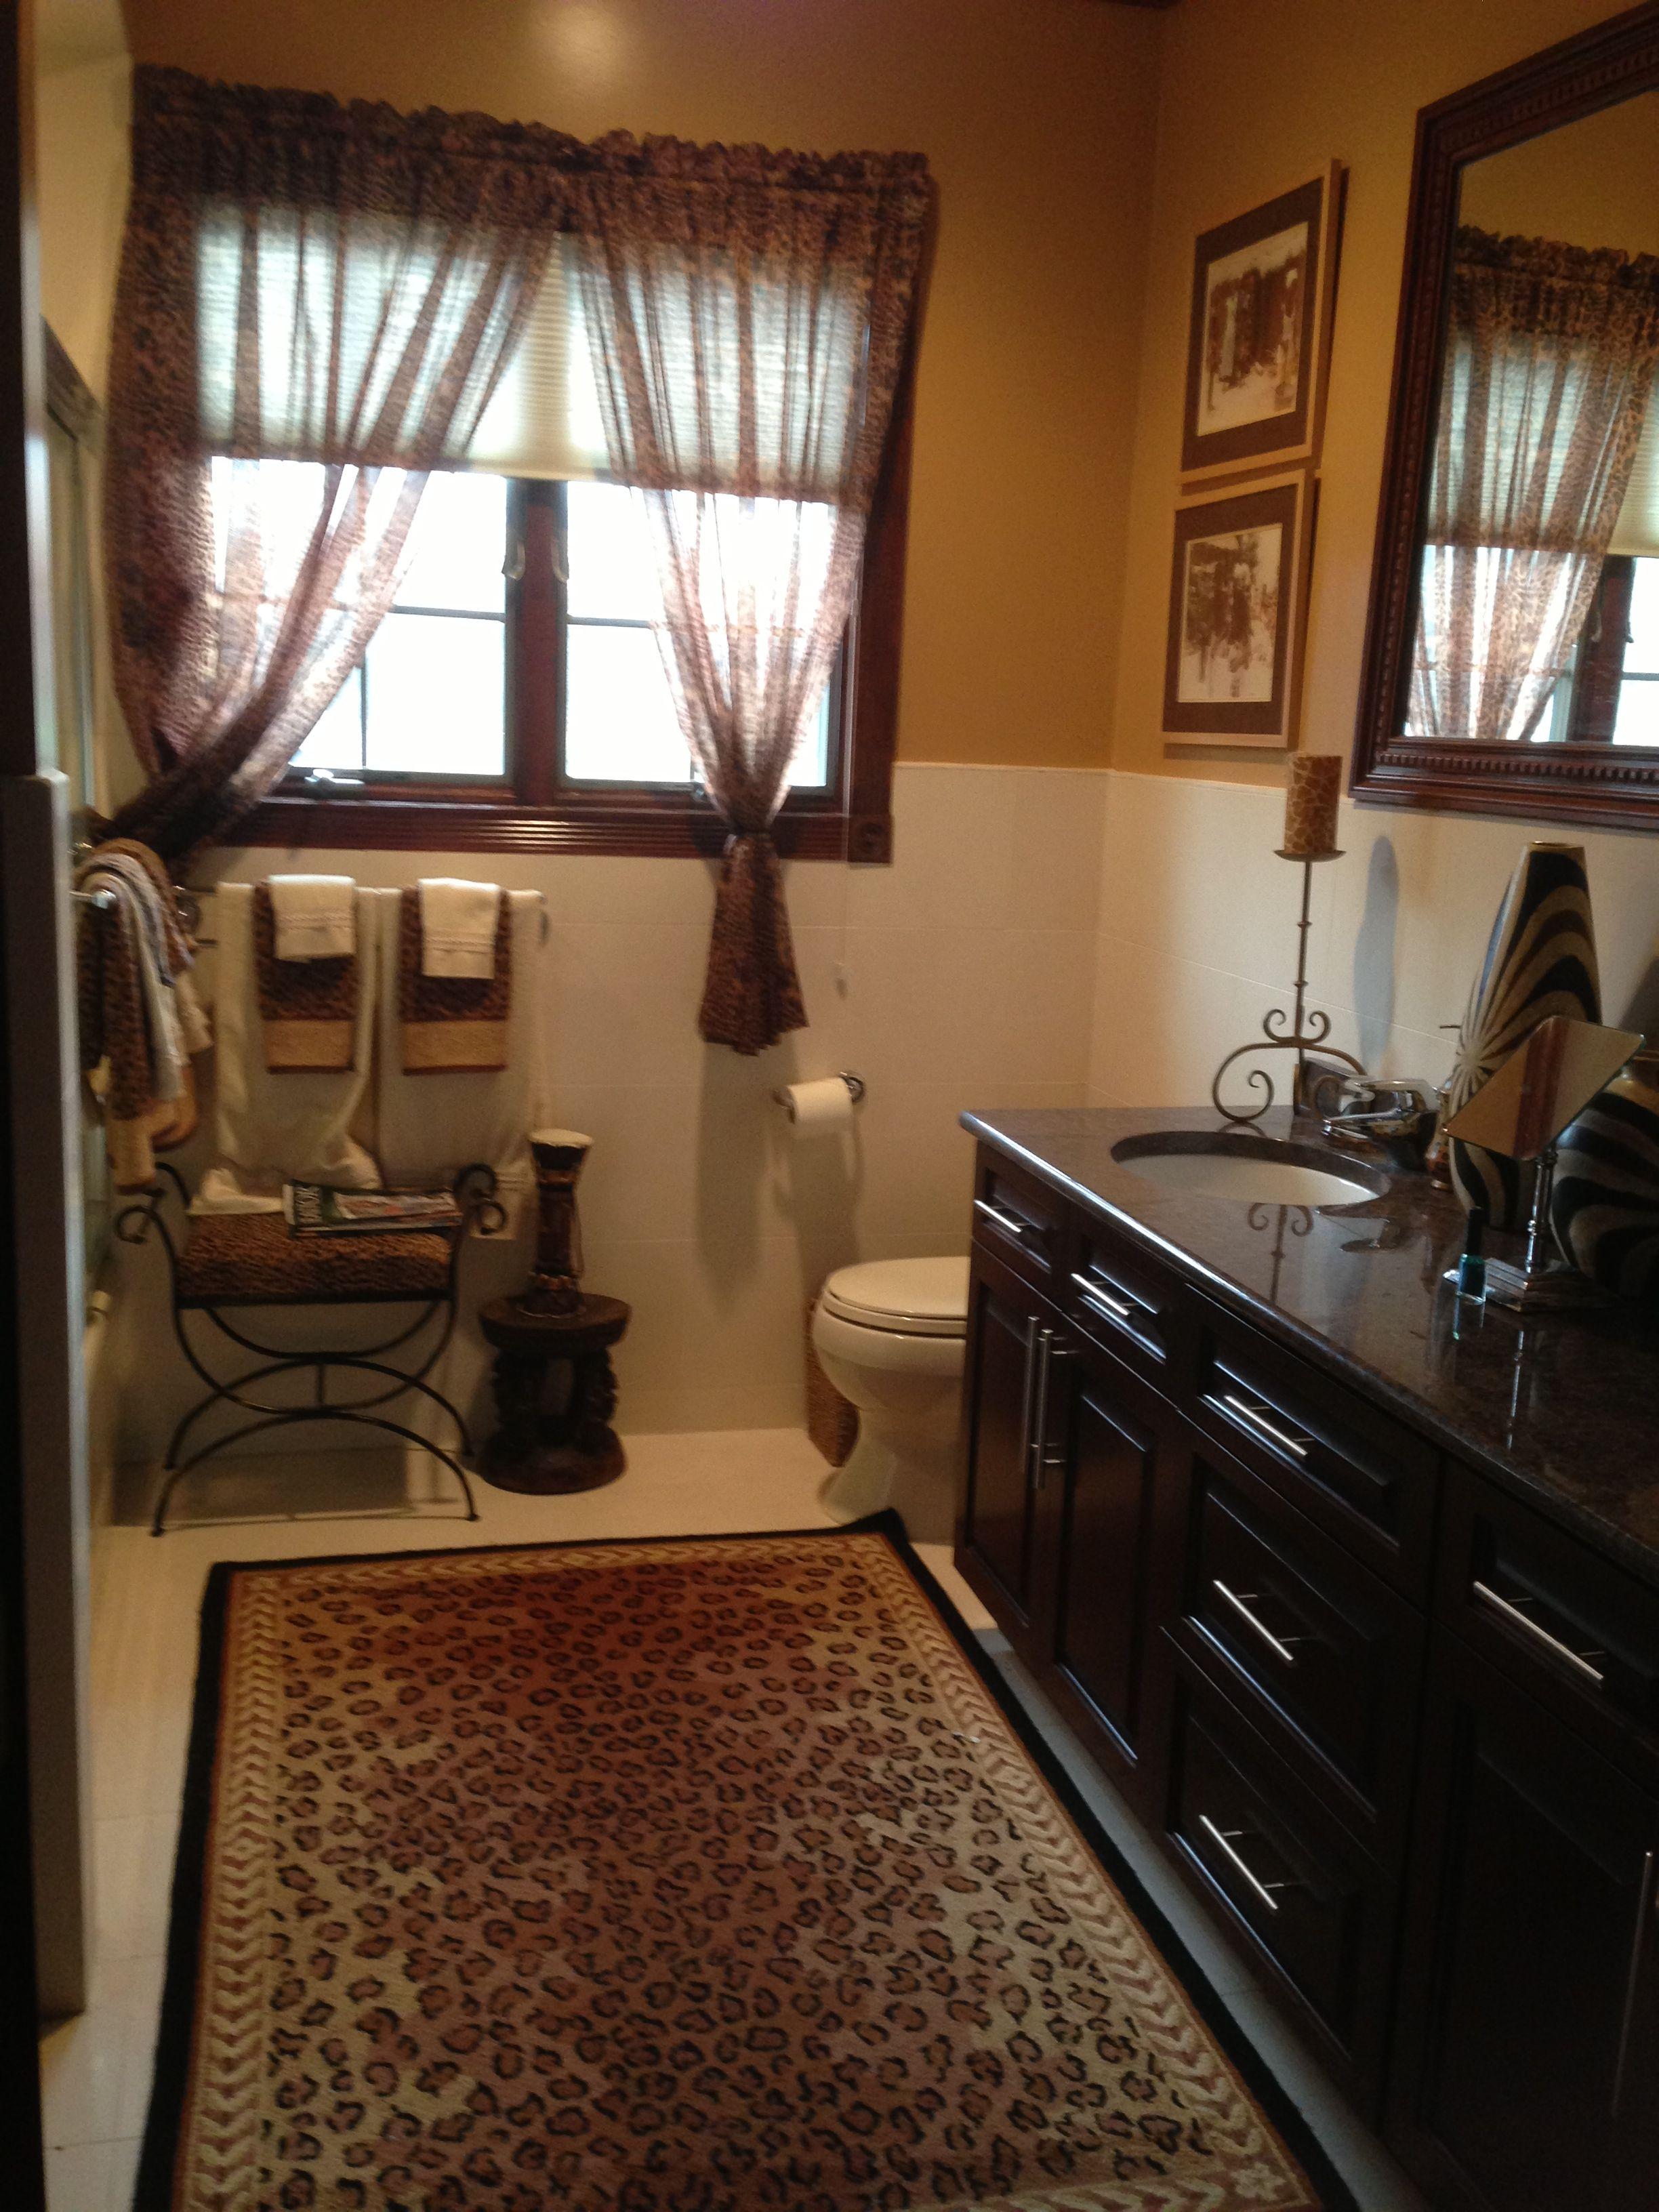 Safari style bathroom with Leopard print accents | Design ...